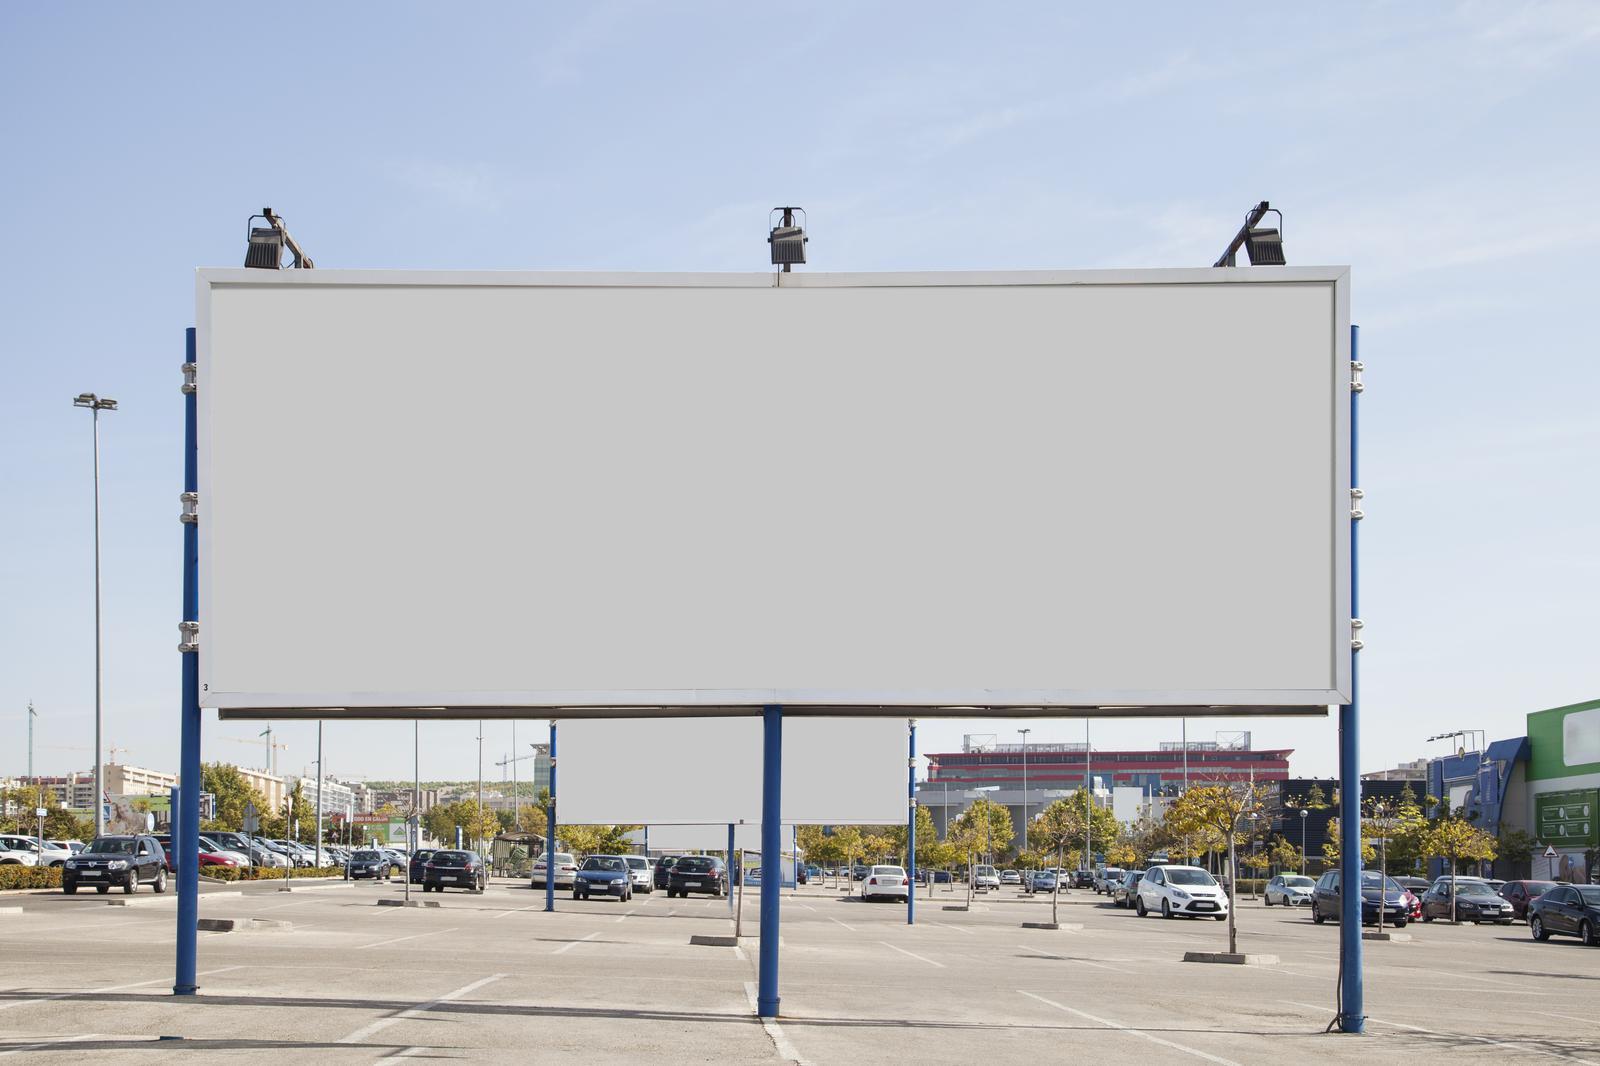 Advertising agencies in Tallinn